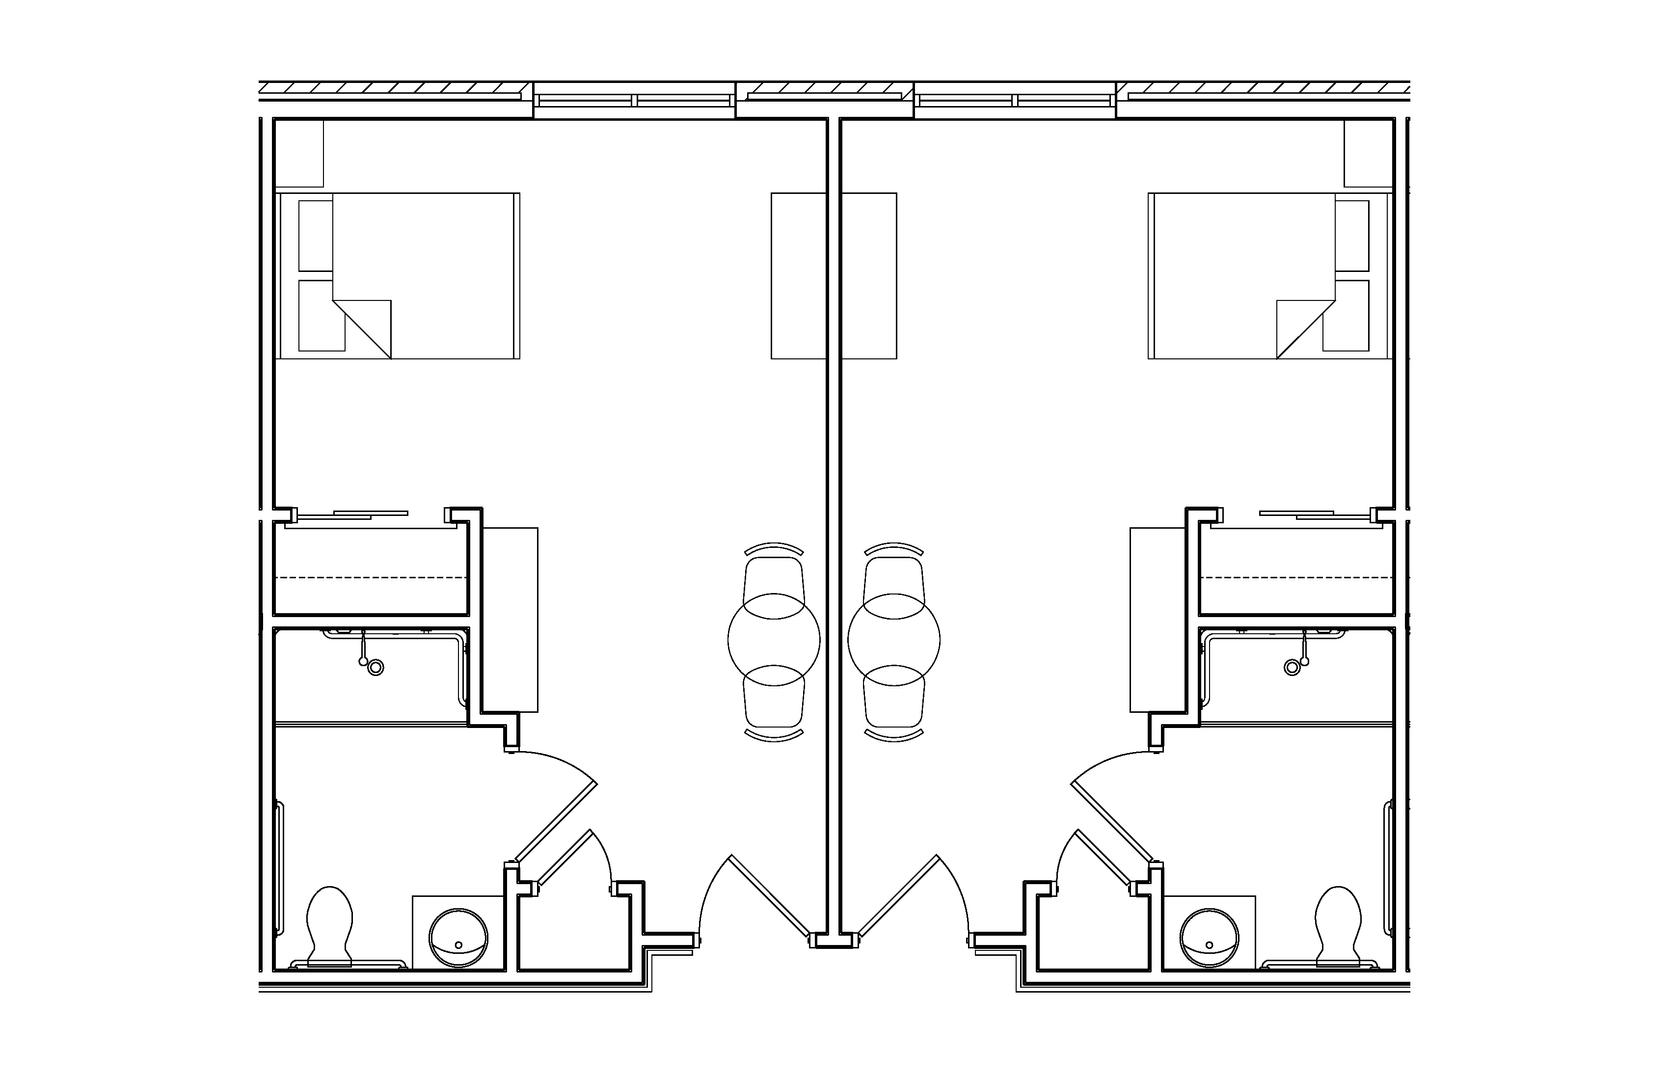 Carolina Suites - Room Layout